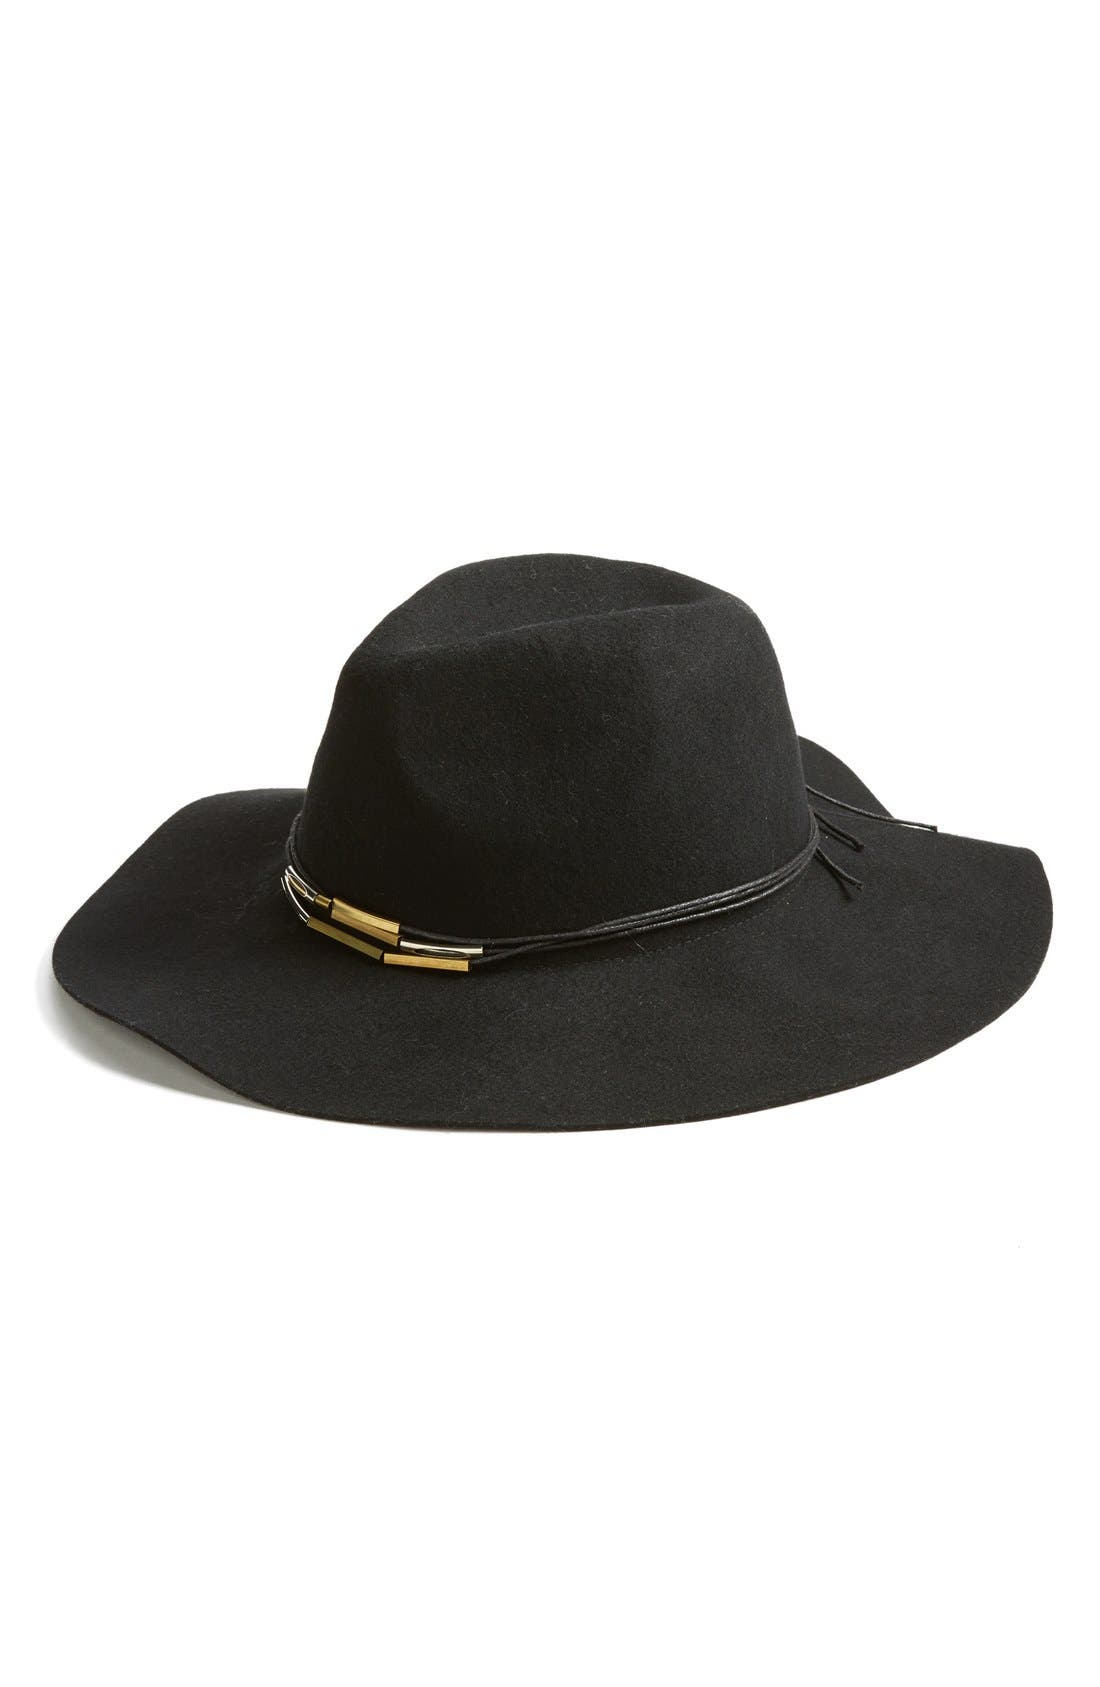 Main Image - BP. Metal Bead Wool Felt Panama Hat